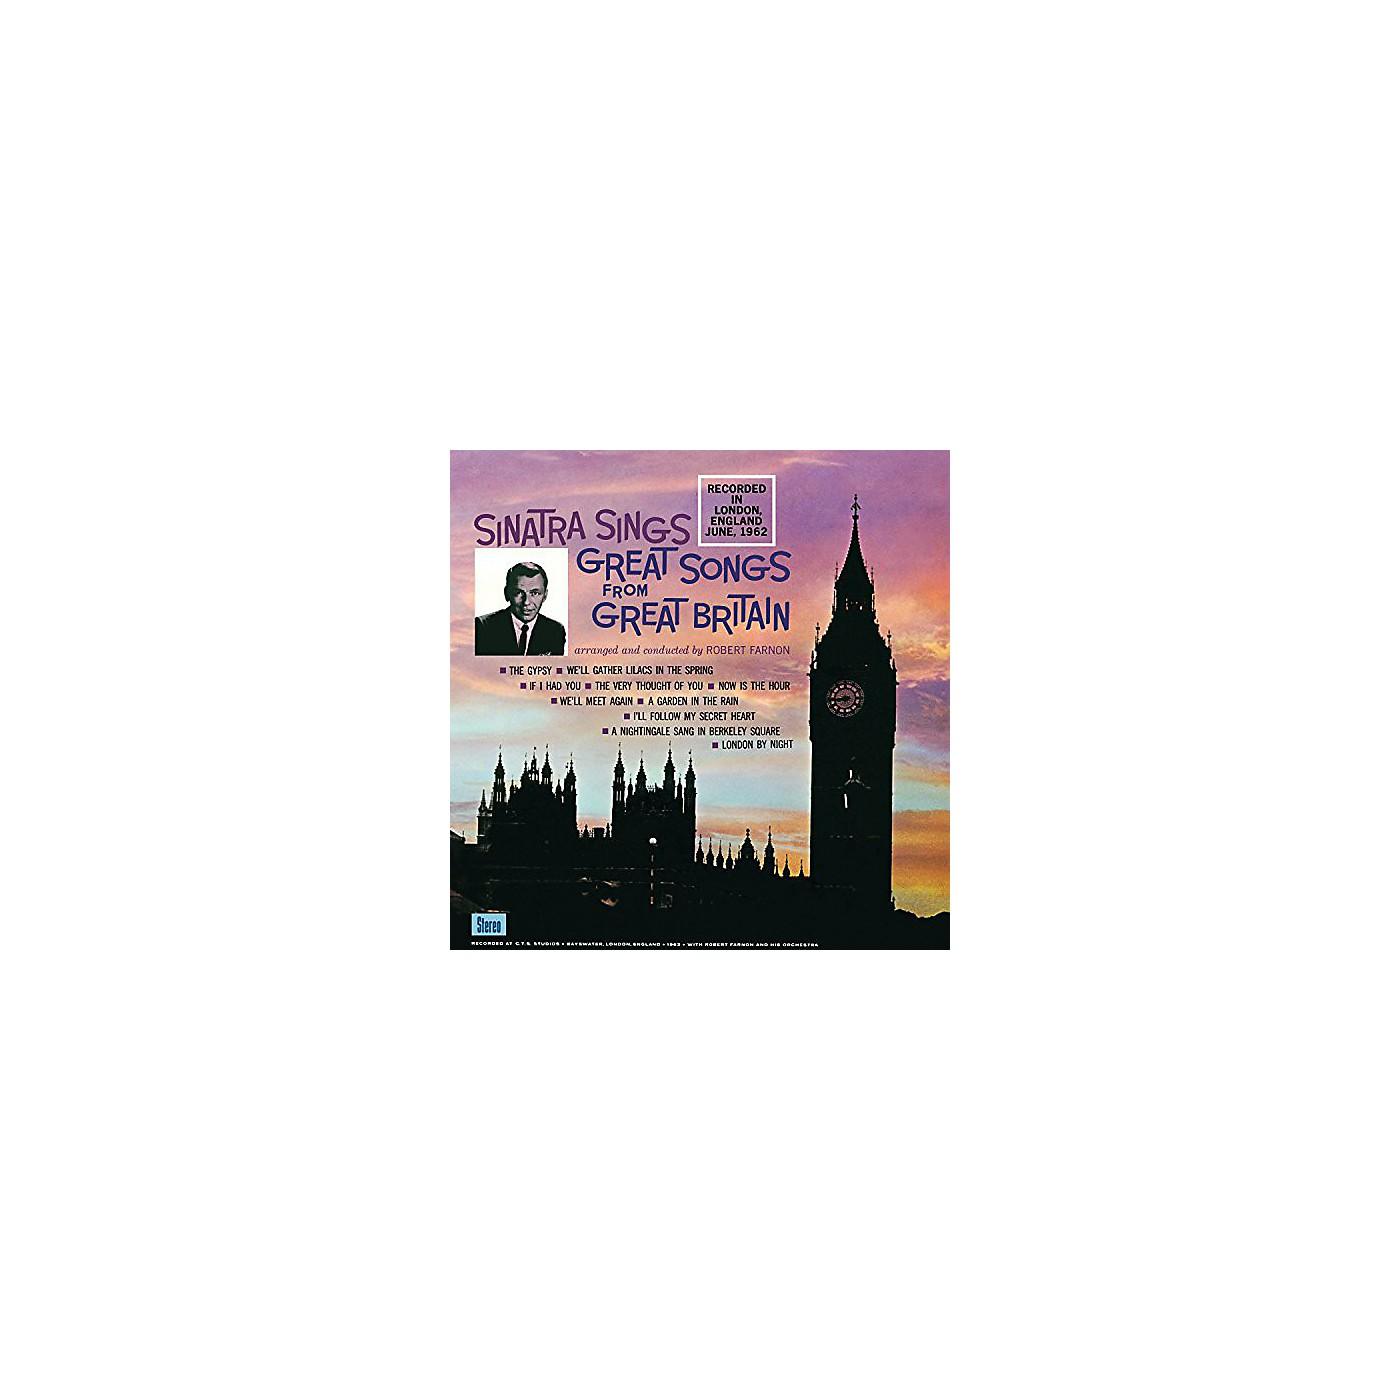 Alliance Frank Sinatra - Sinatra Sings Great Songs from Great Britian thumbnail